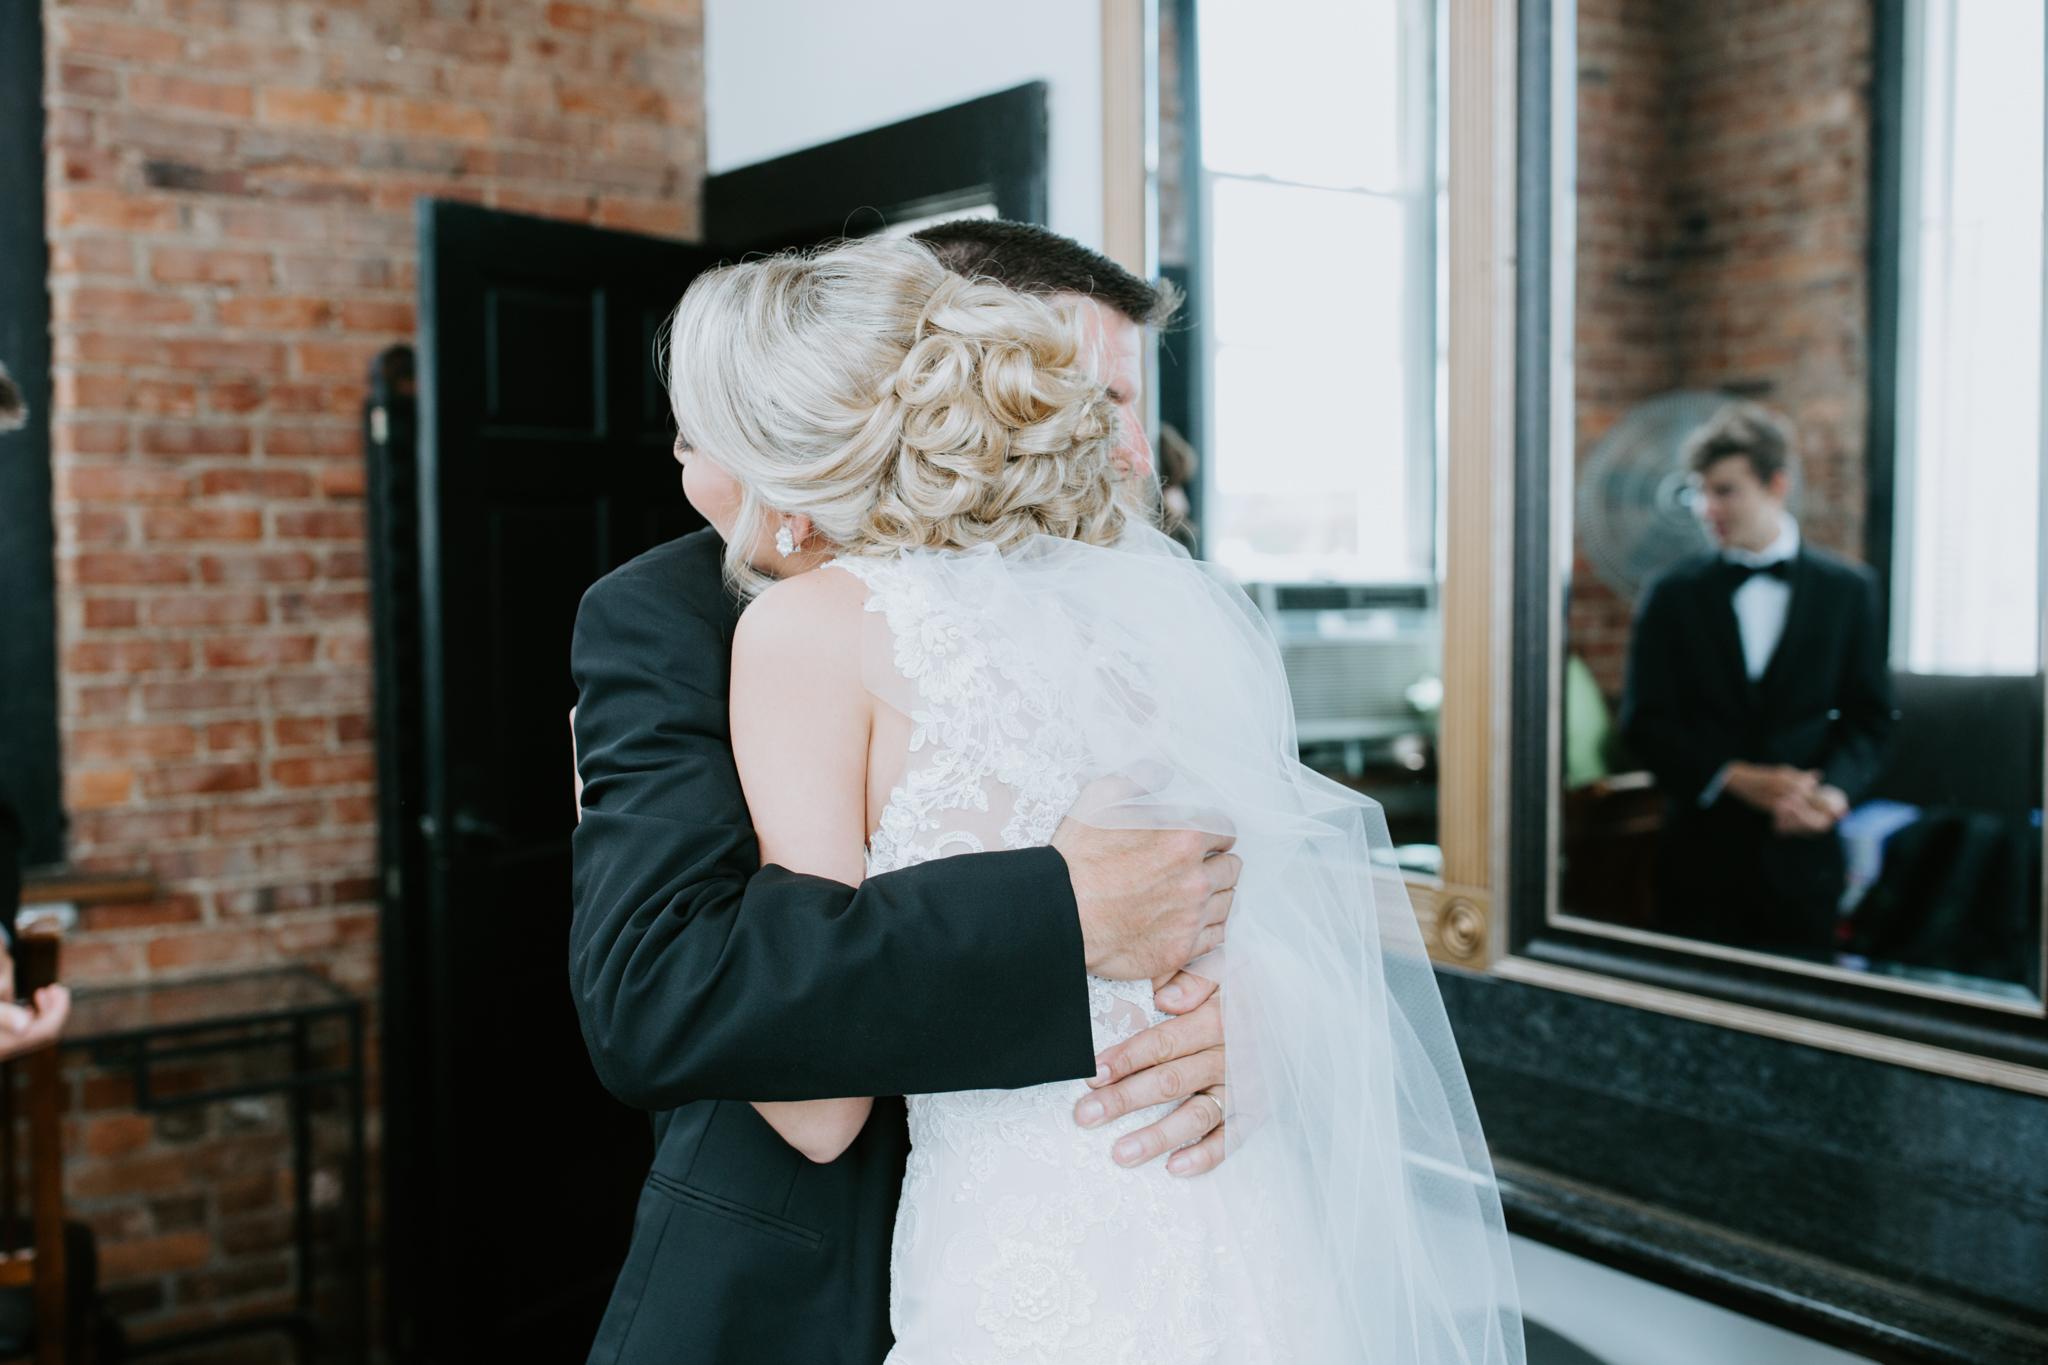 Kayley + Robert + Chattanooga + Nashville + Tennessee + Wedding + Photography-9.jpg